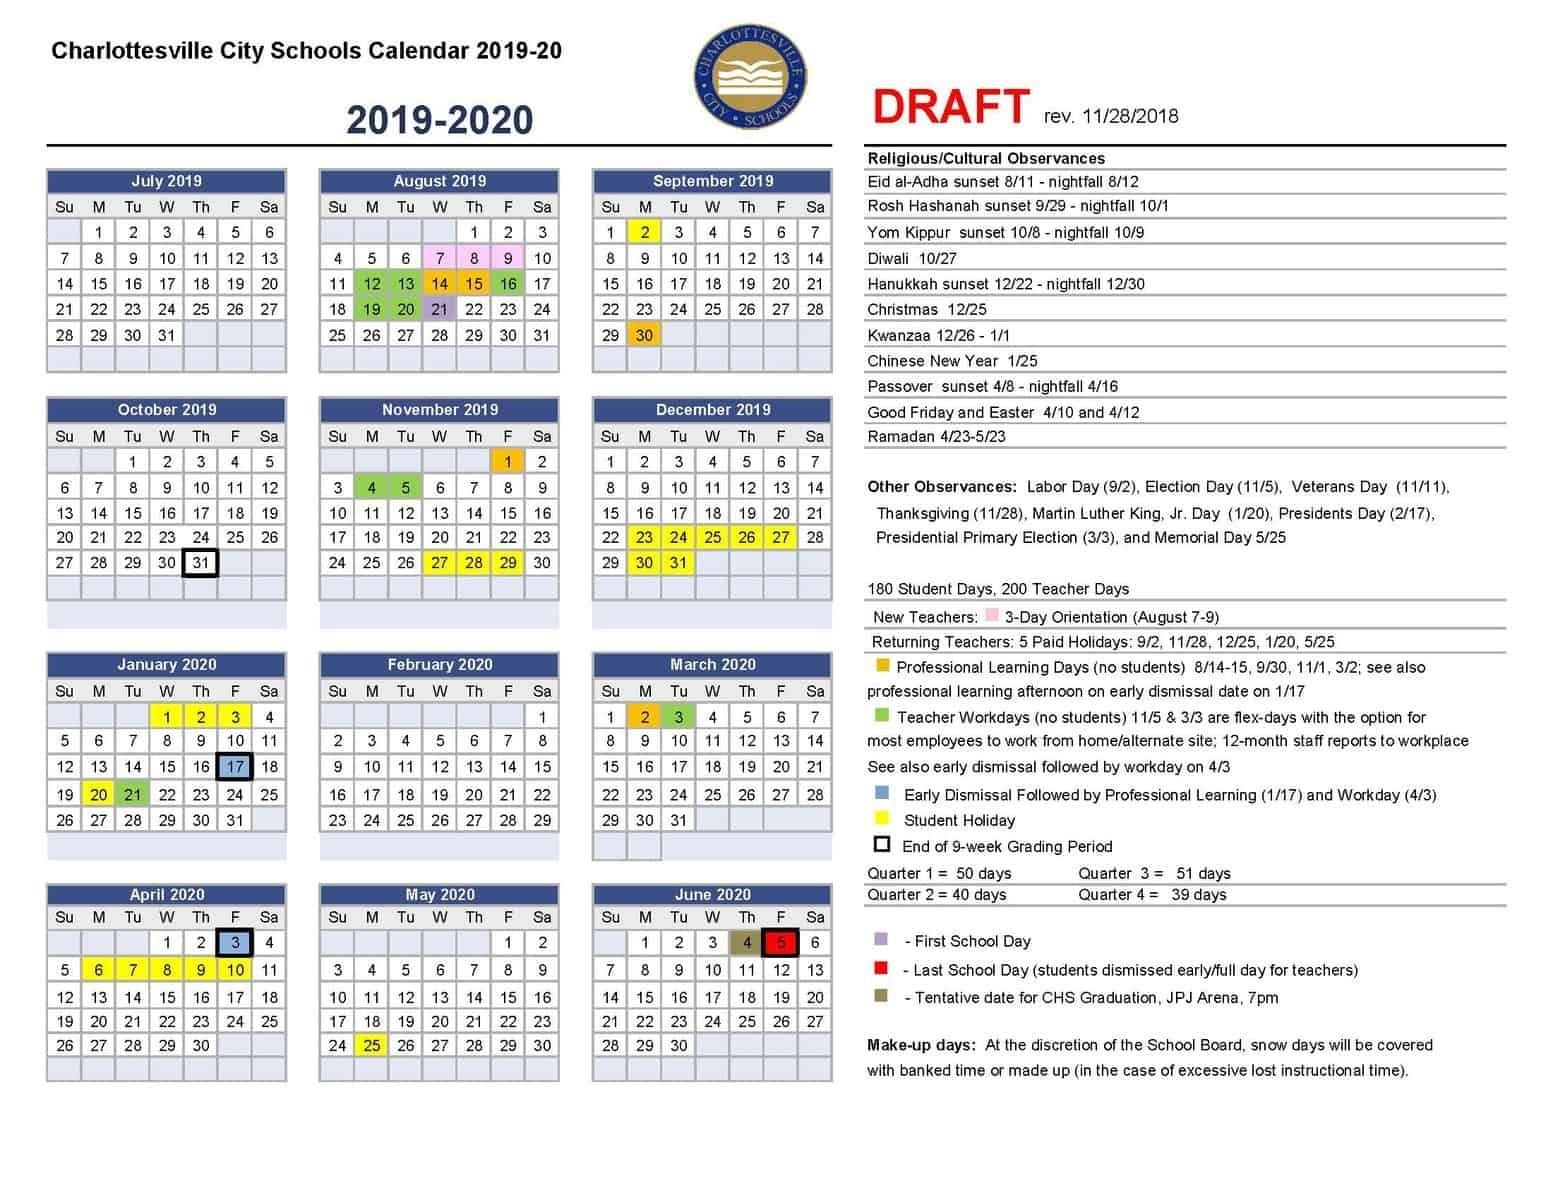 Draft Calendar For 2019 20 | Charlottesville City Schools School Calendar 2019 20